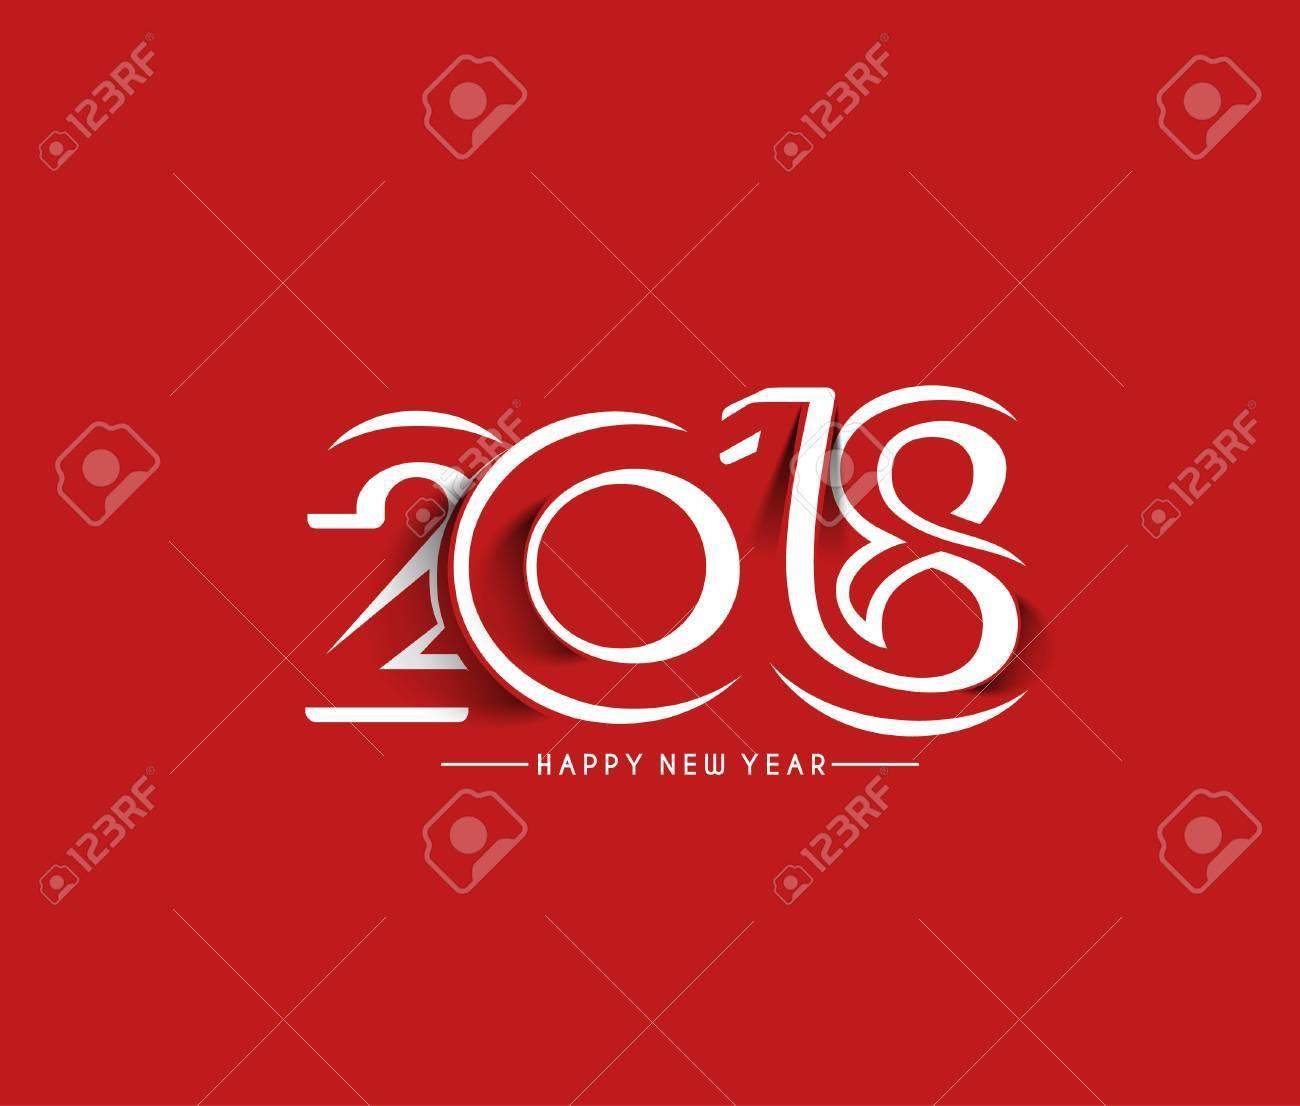 Happy new year 2018 Text Design, Vector illustration. Stock Vector - 89472598